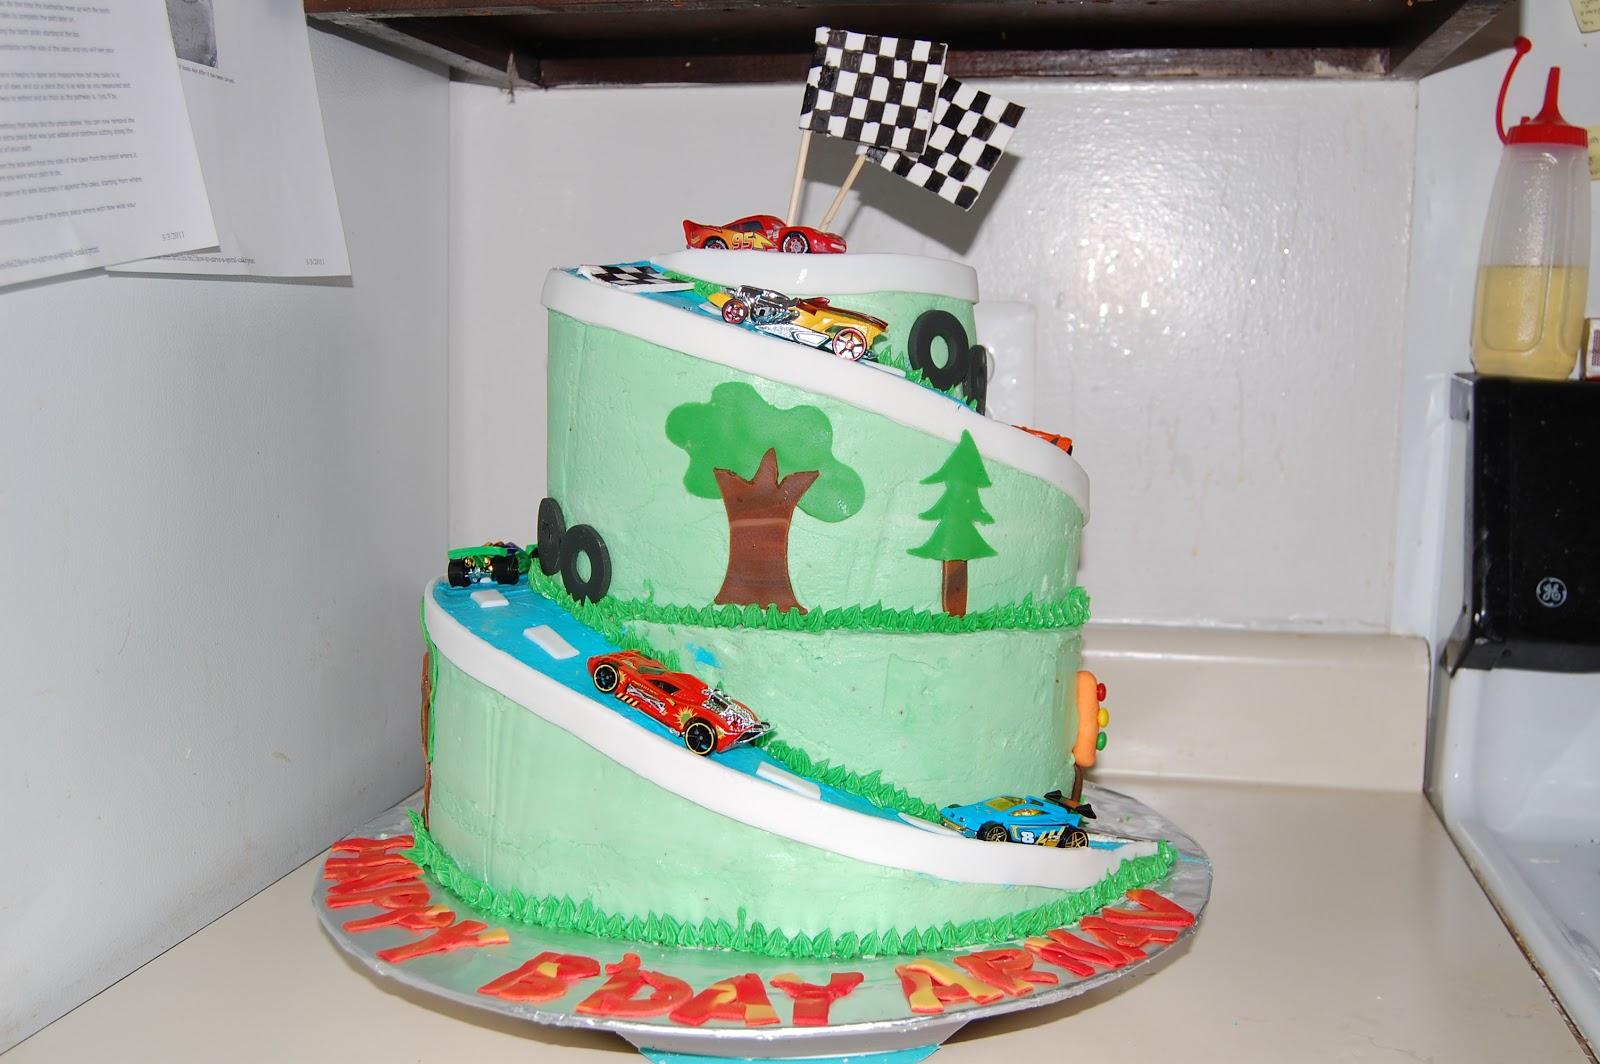 ilovecakes Car themed birthday cake